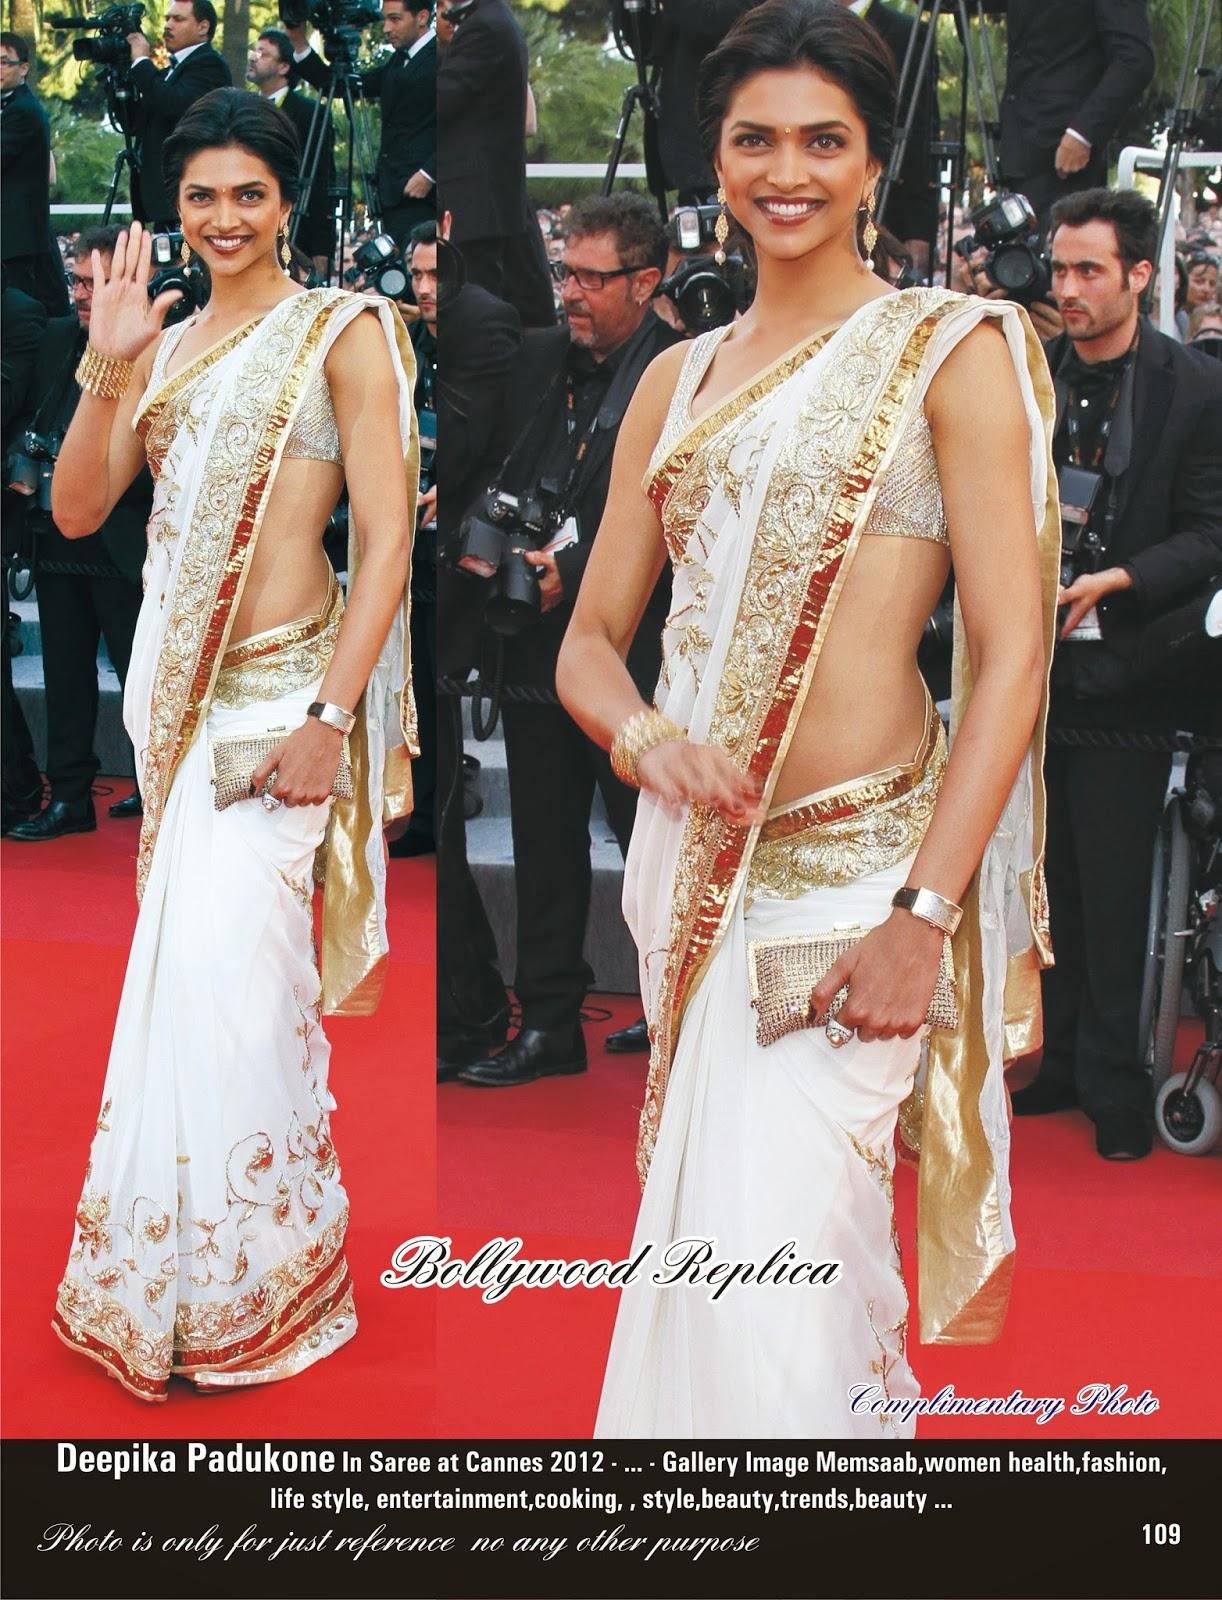 Keep it Stylish!!: Deepika Padukone Sarees and Dresses